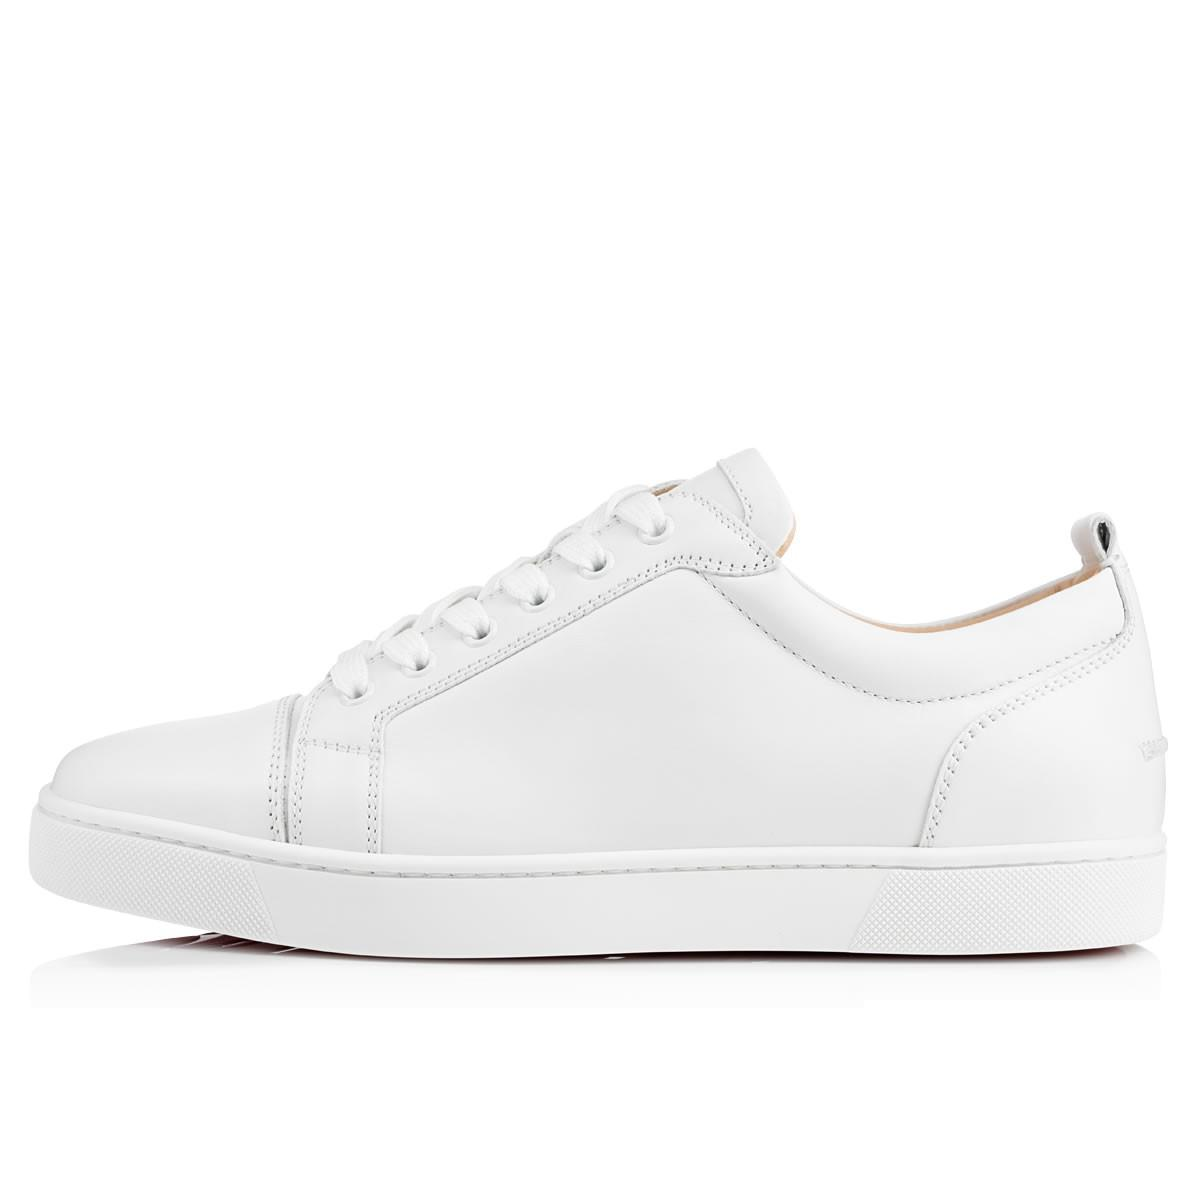 4cb67232e16 Christian Louboutin - White Louis Junior Leather Low-Top Sneakers for Men -  Lyst. View fullscreen